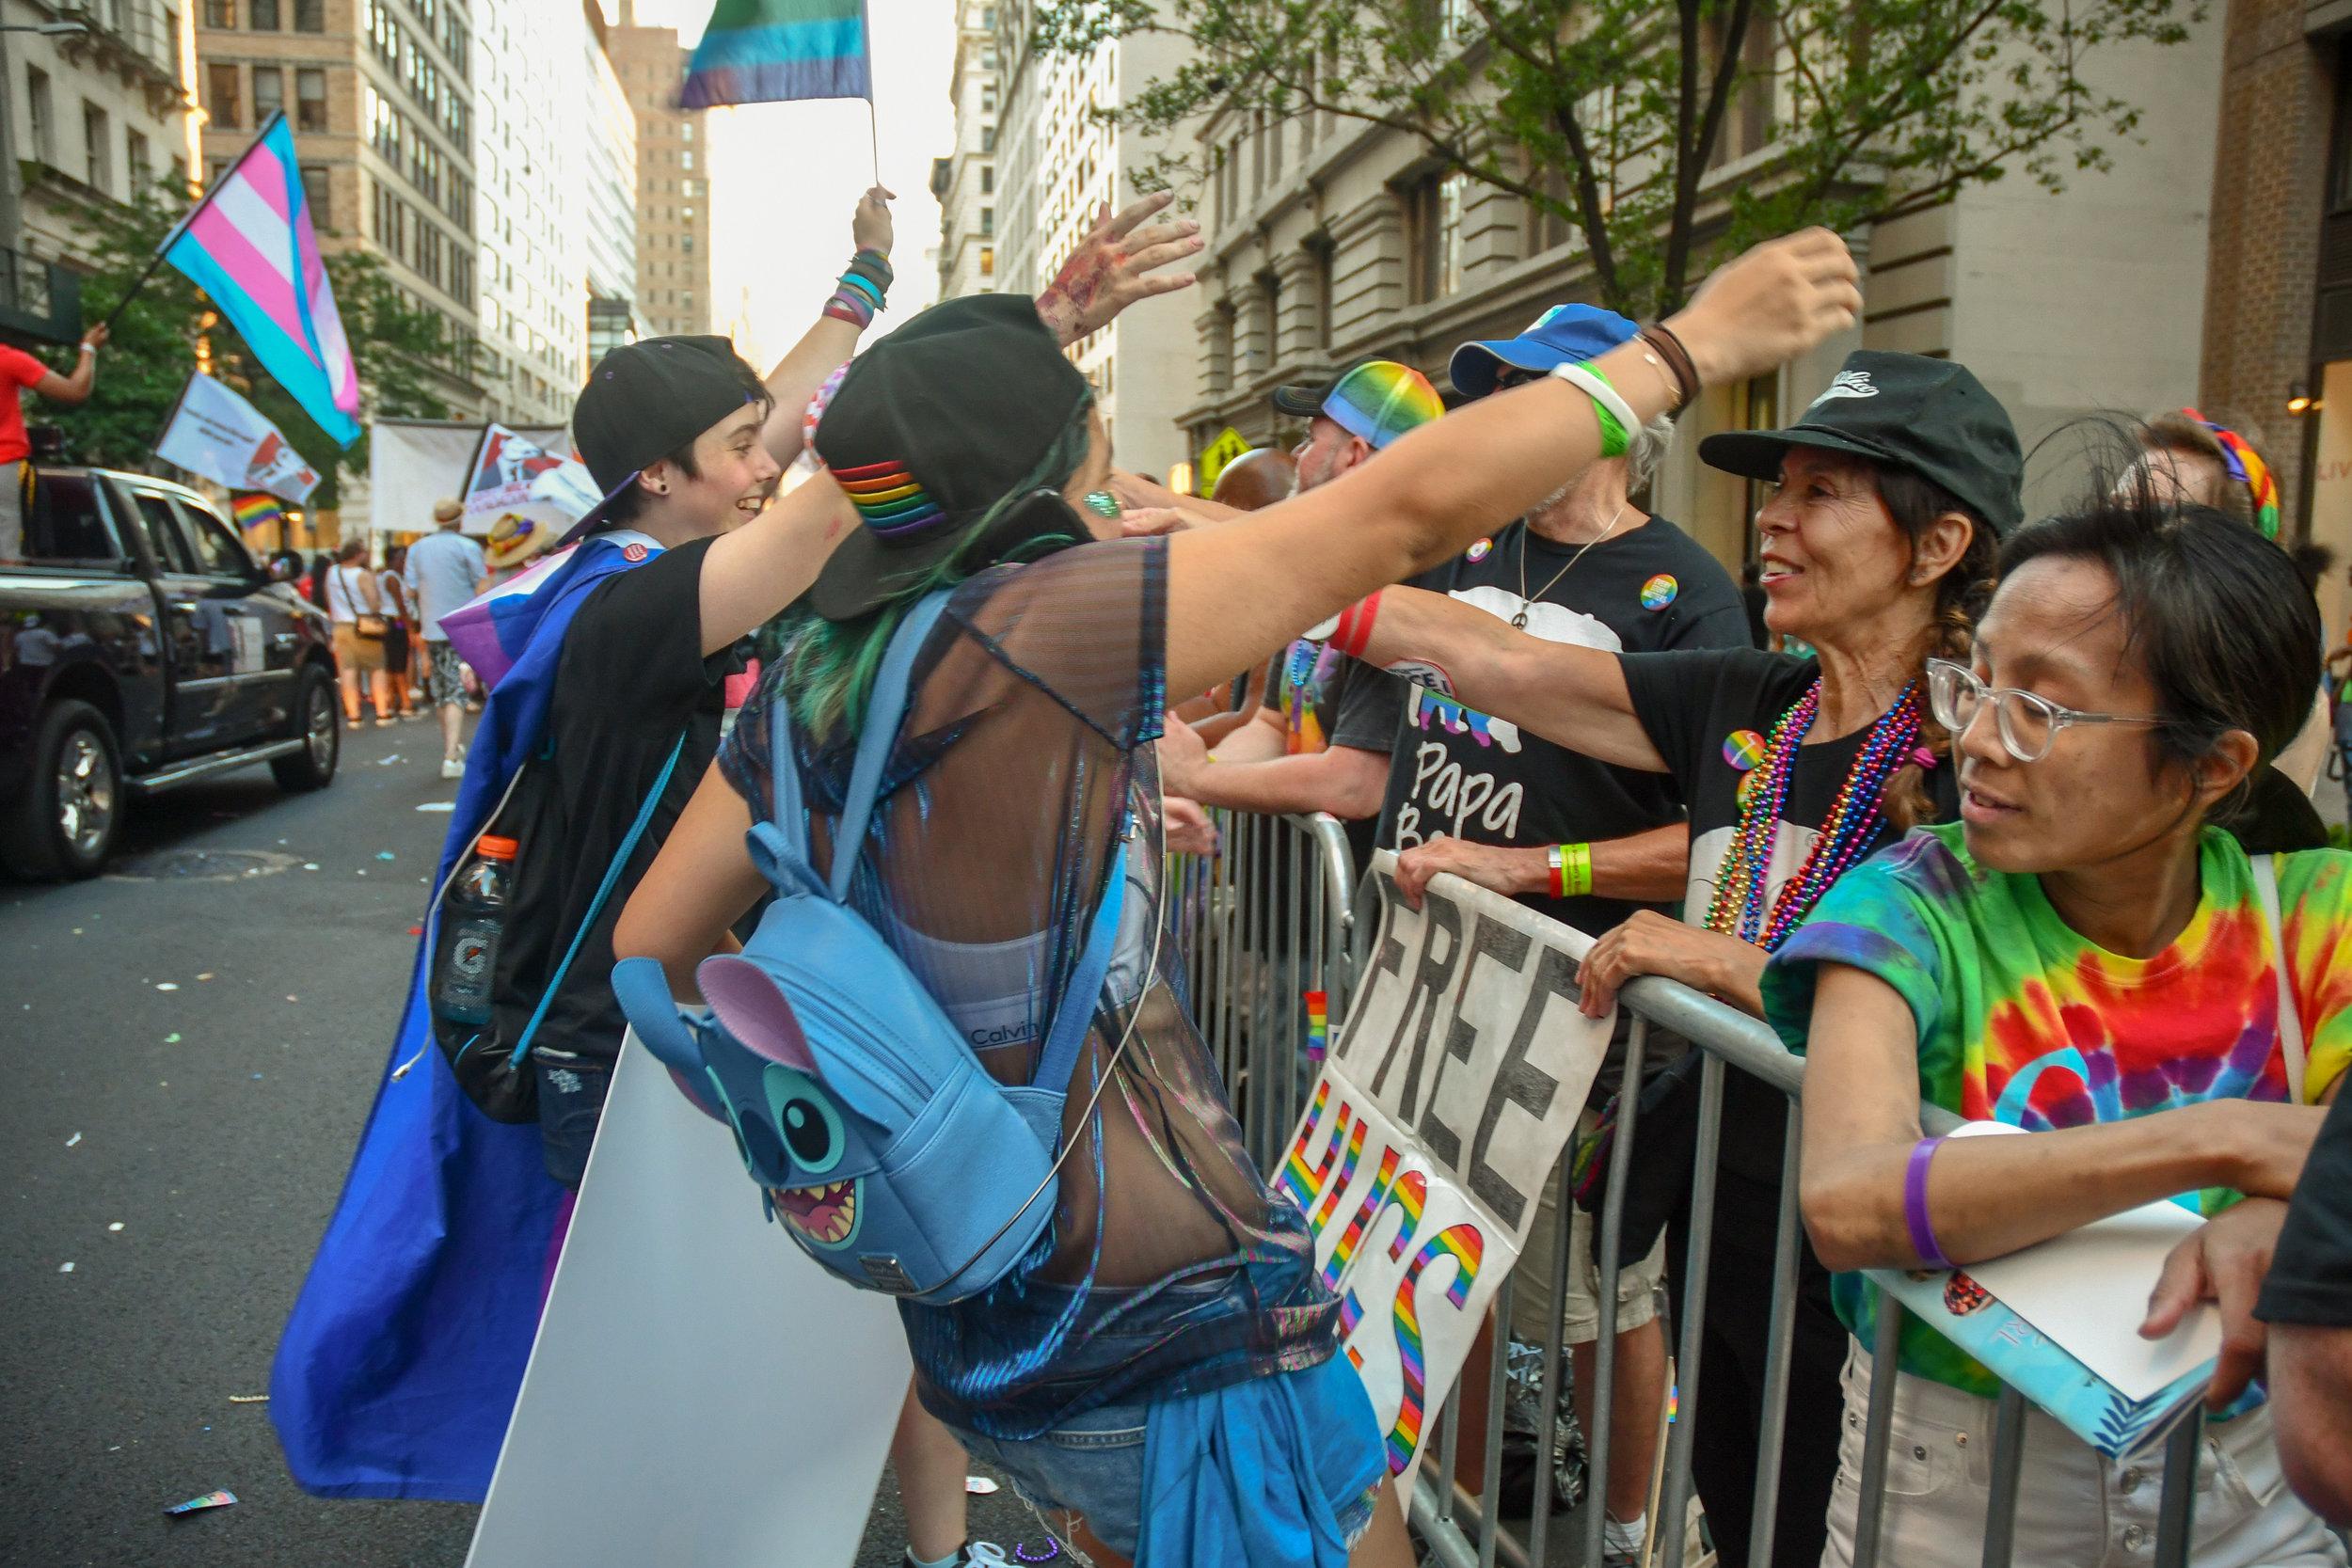 SC-PrideParade-2019_FE-225.jpg